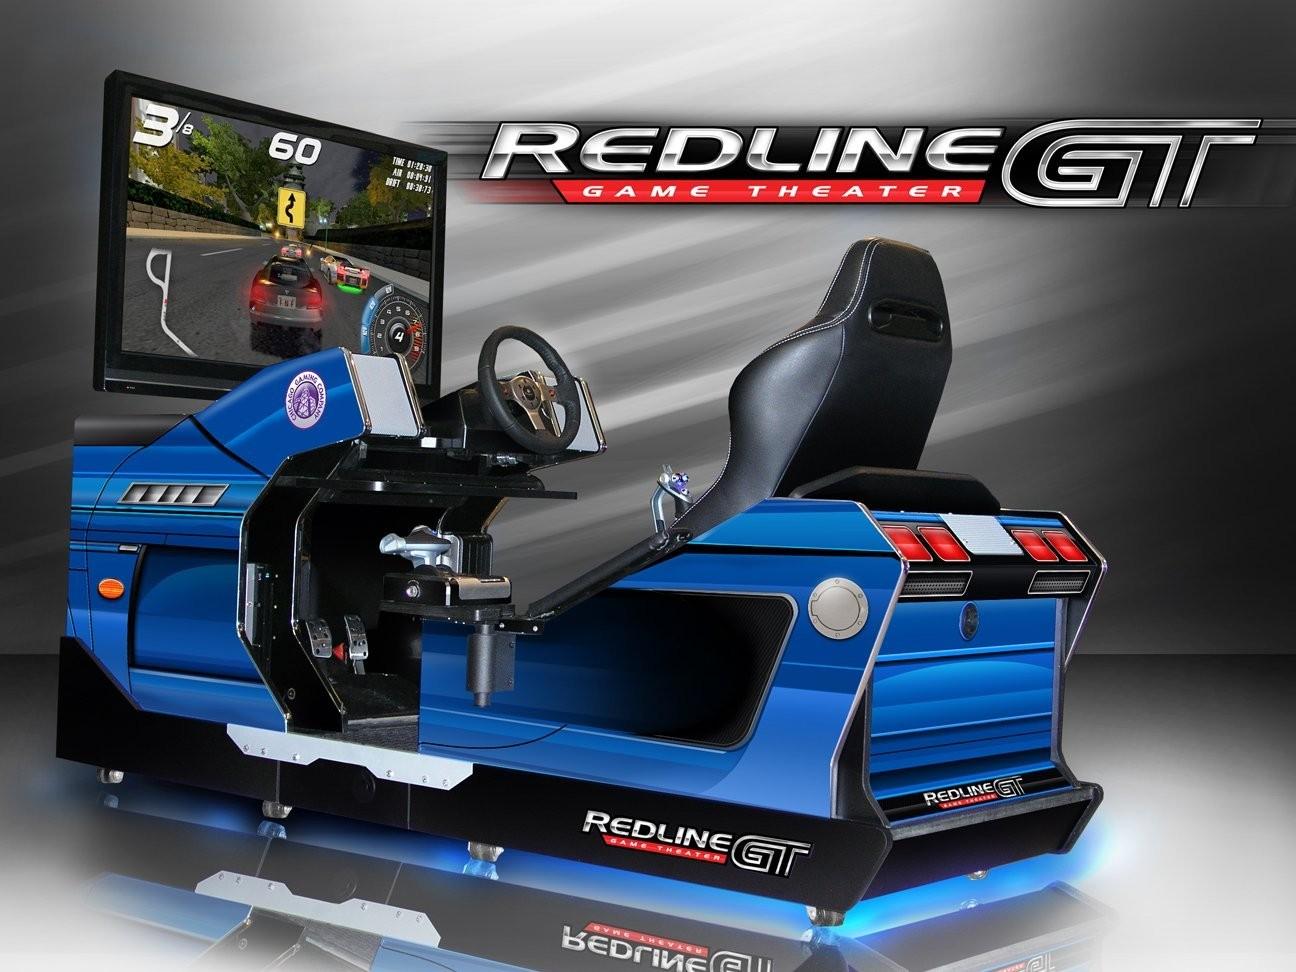 Silla Simulador para Videojuego Chicago Redline GT